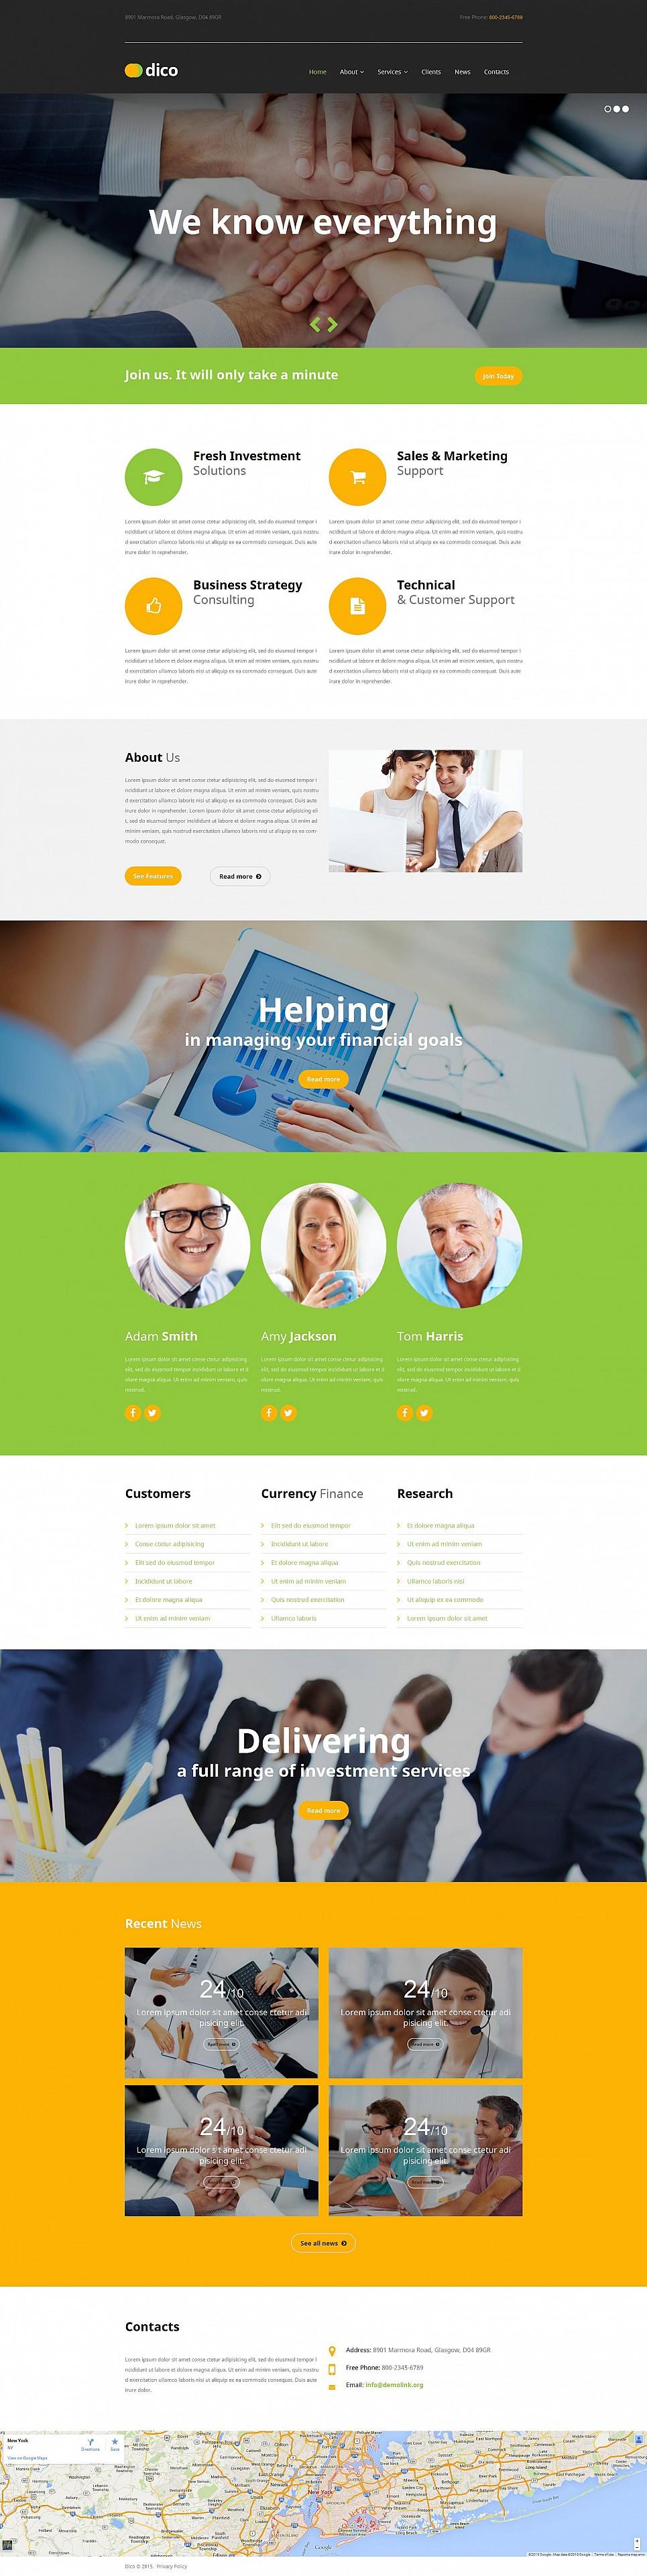 Responsive Business Website Design - image